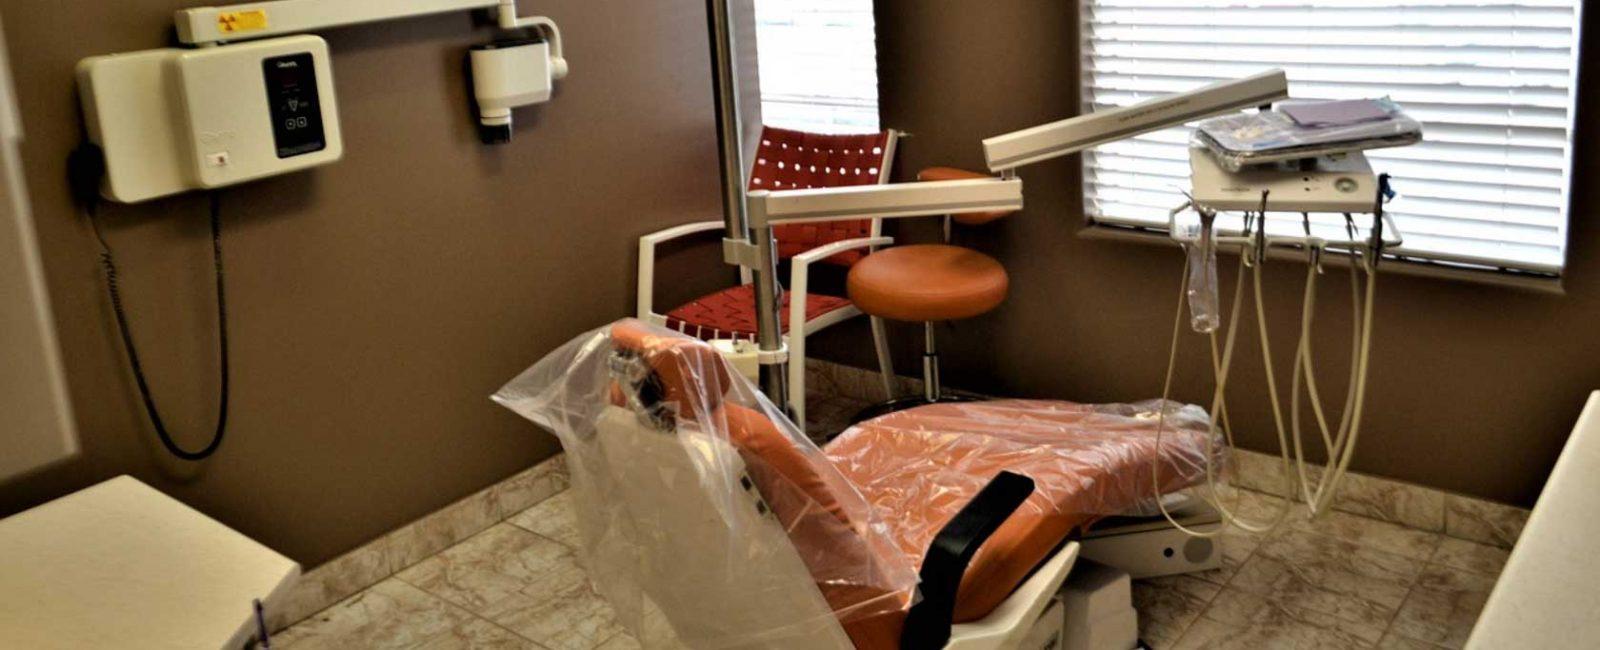 Choosing Dental Insurance